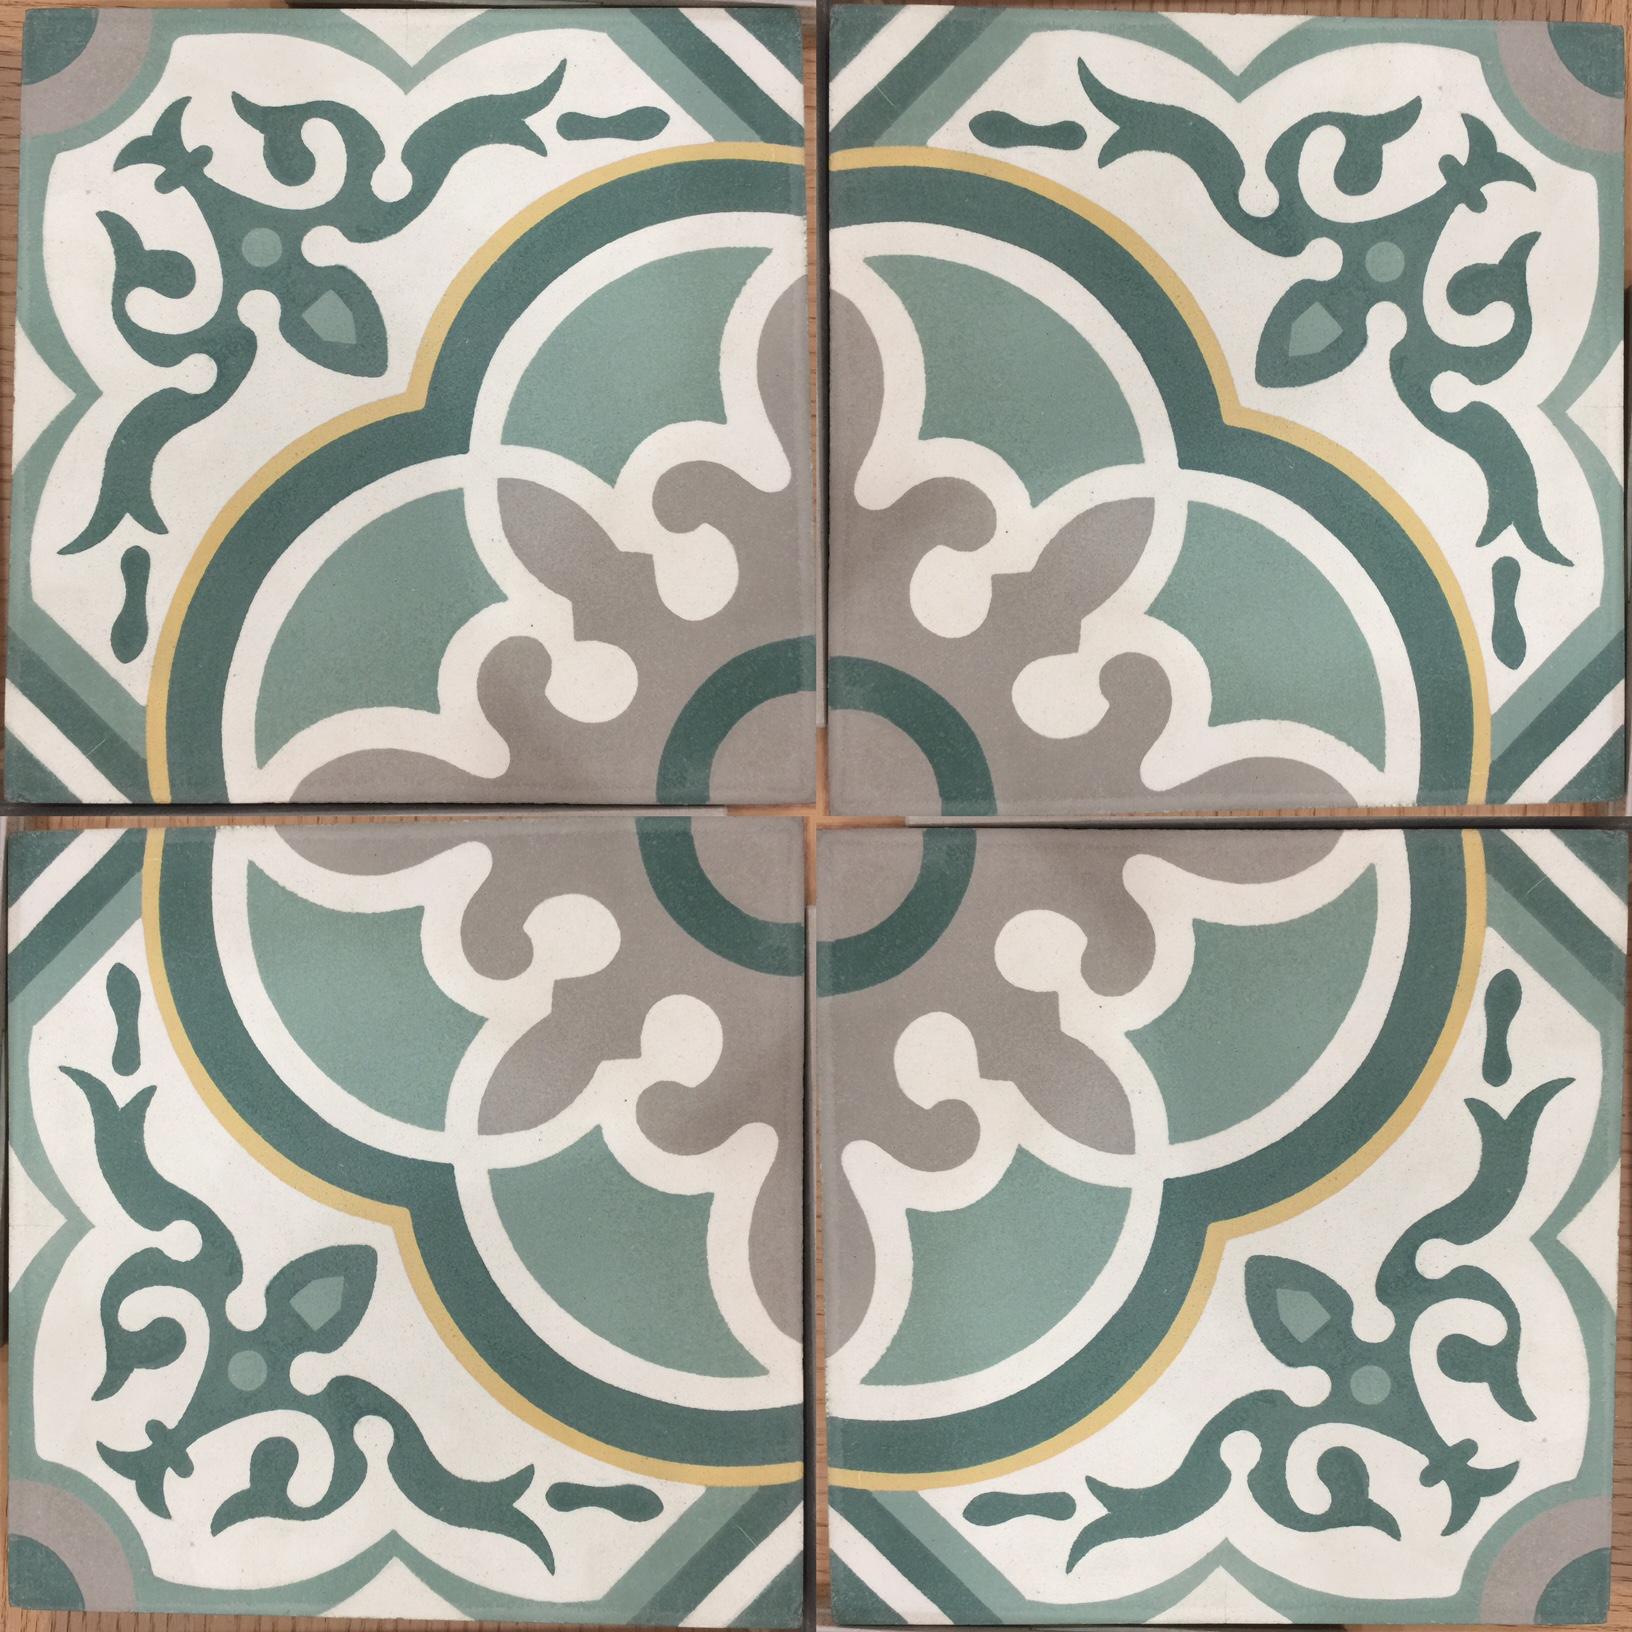 5 color 4 tile pattern